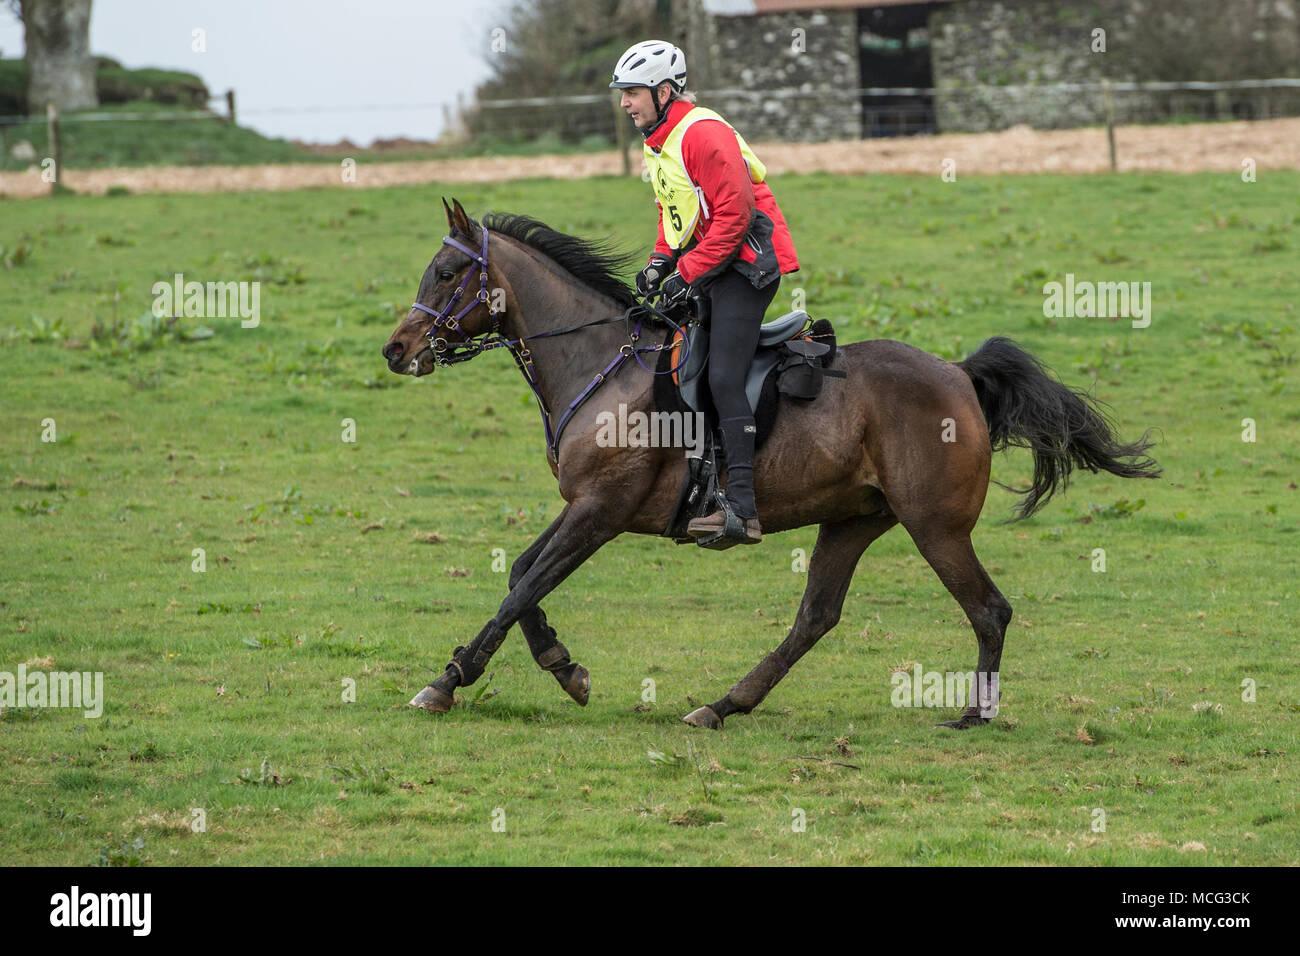 man galloping a horse on an endurance race UK - Stock Image